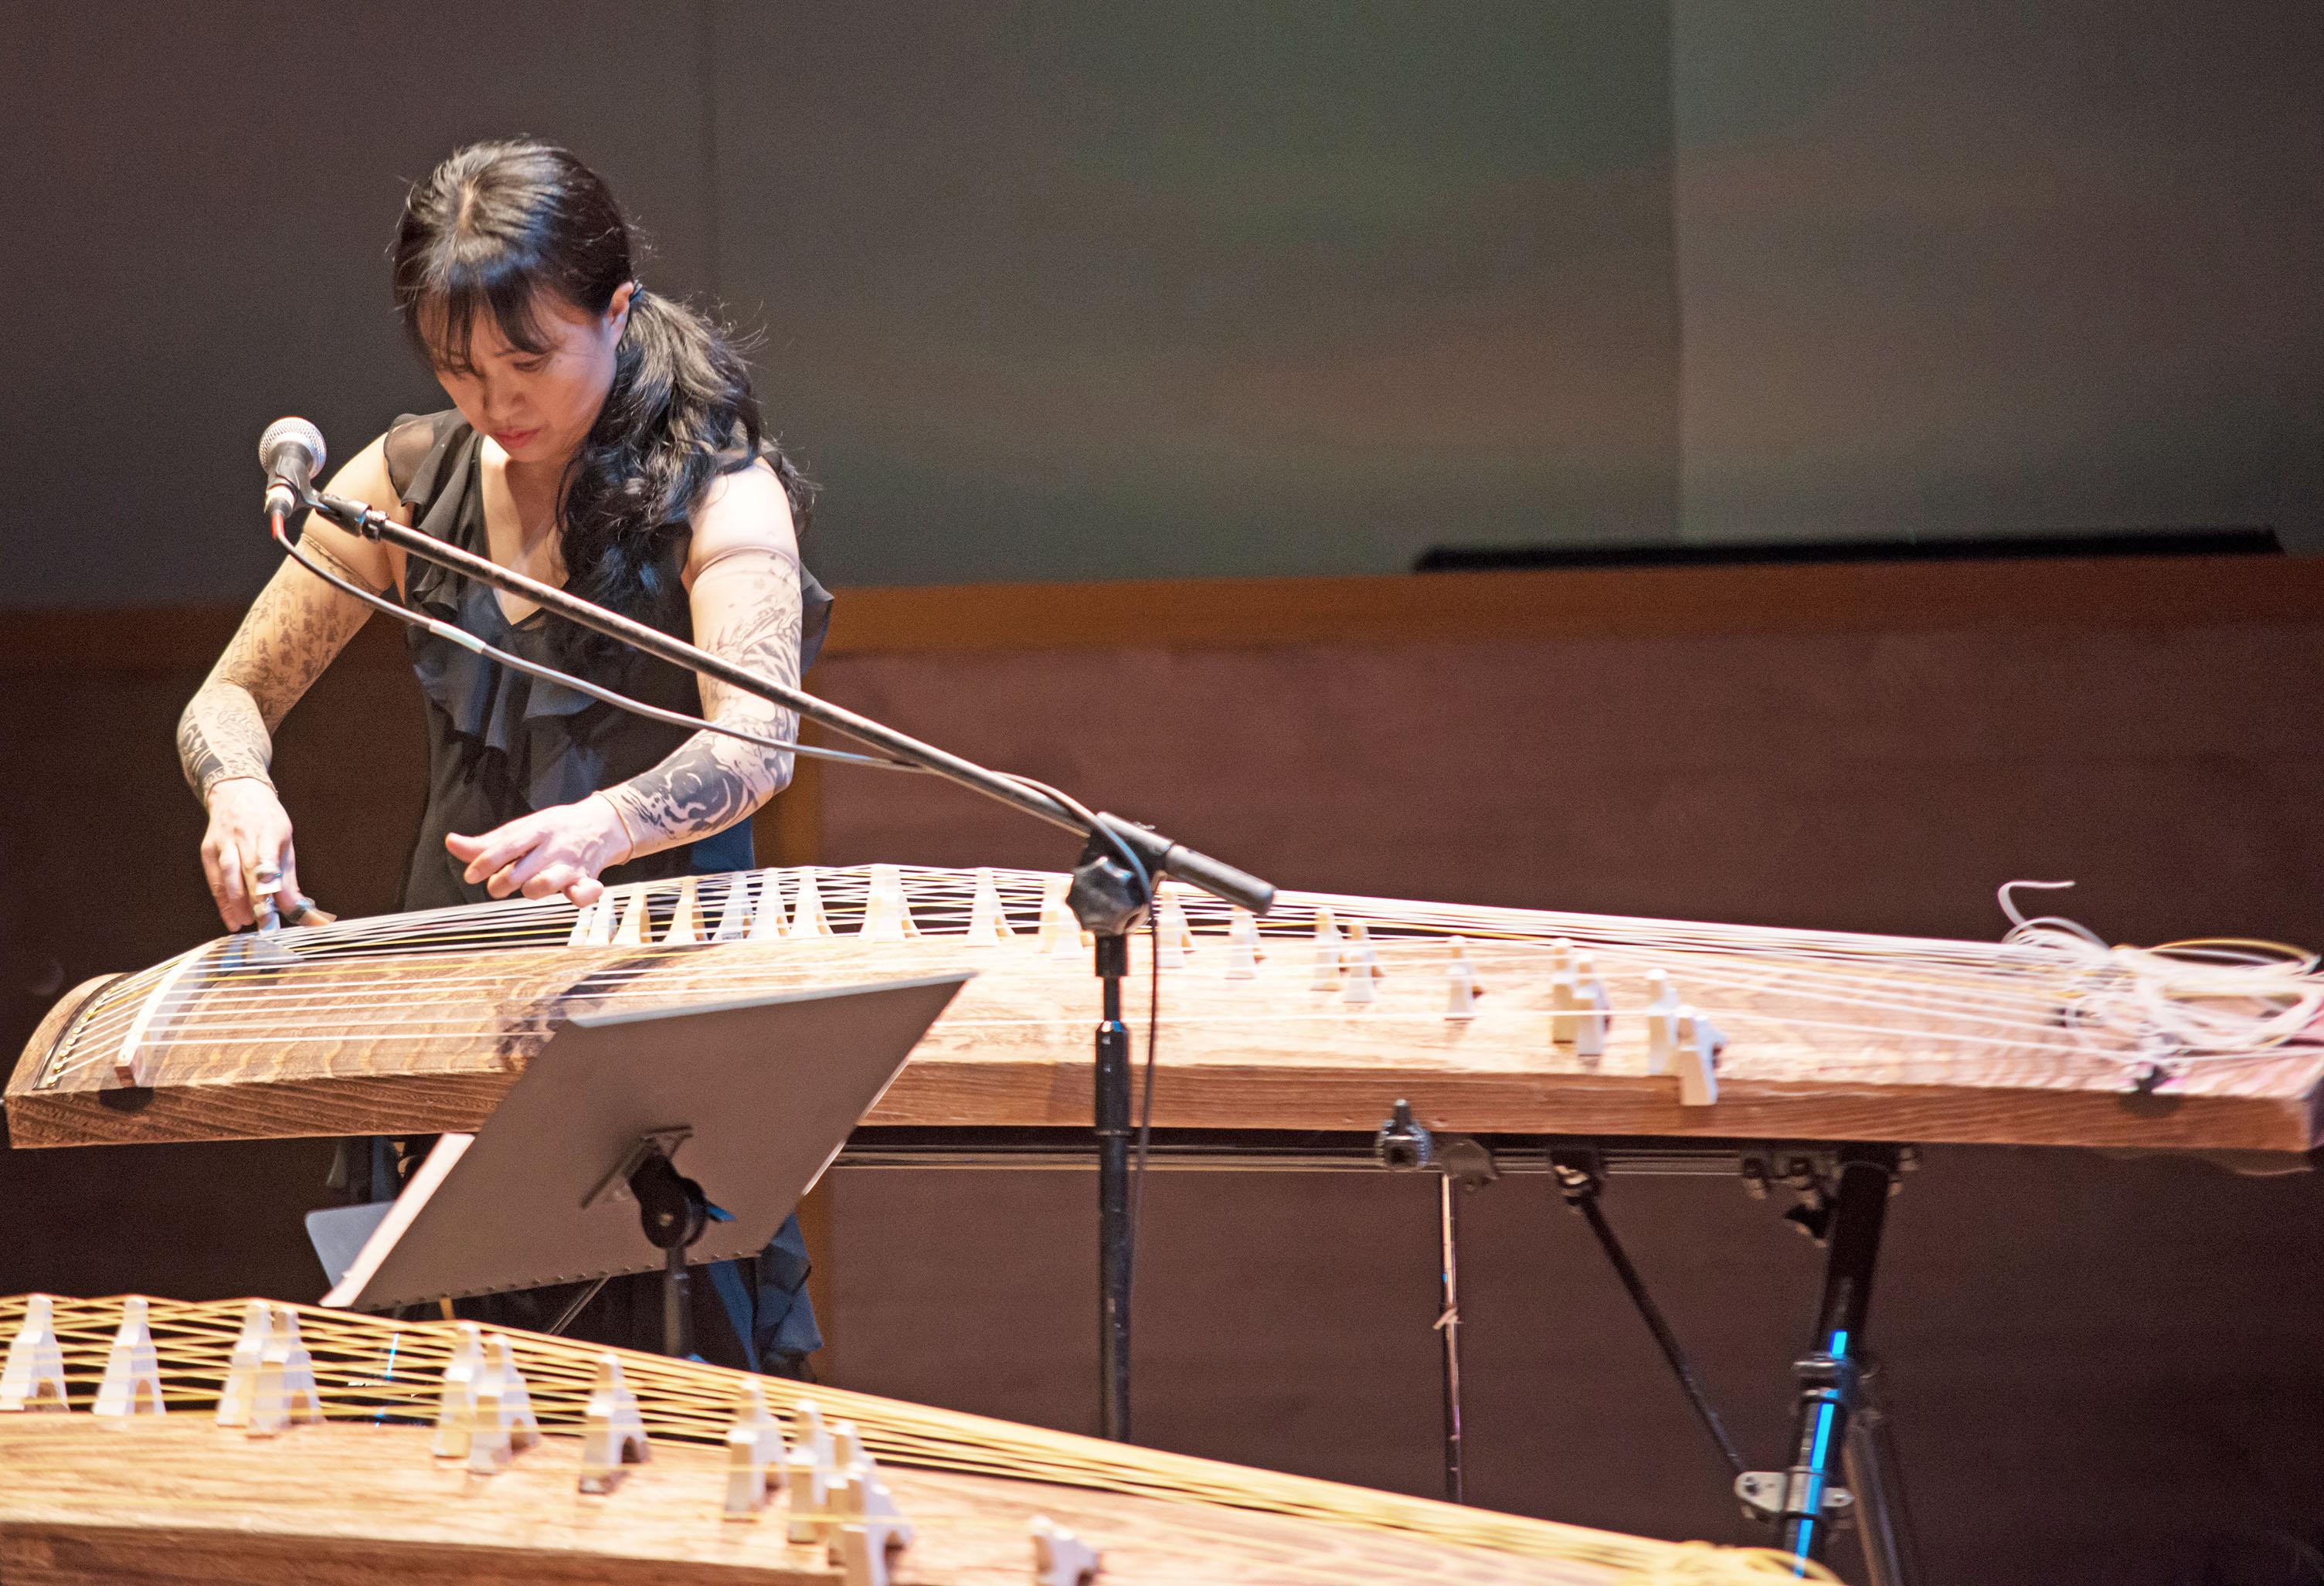 Michiyo yagi trio deluxe @ jazztopad 2013